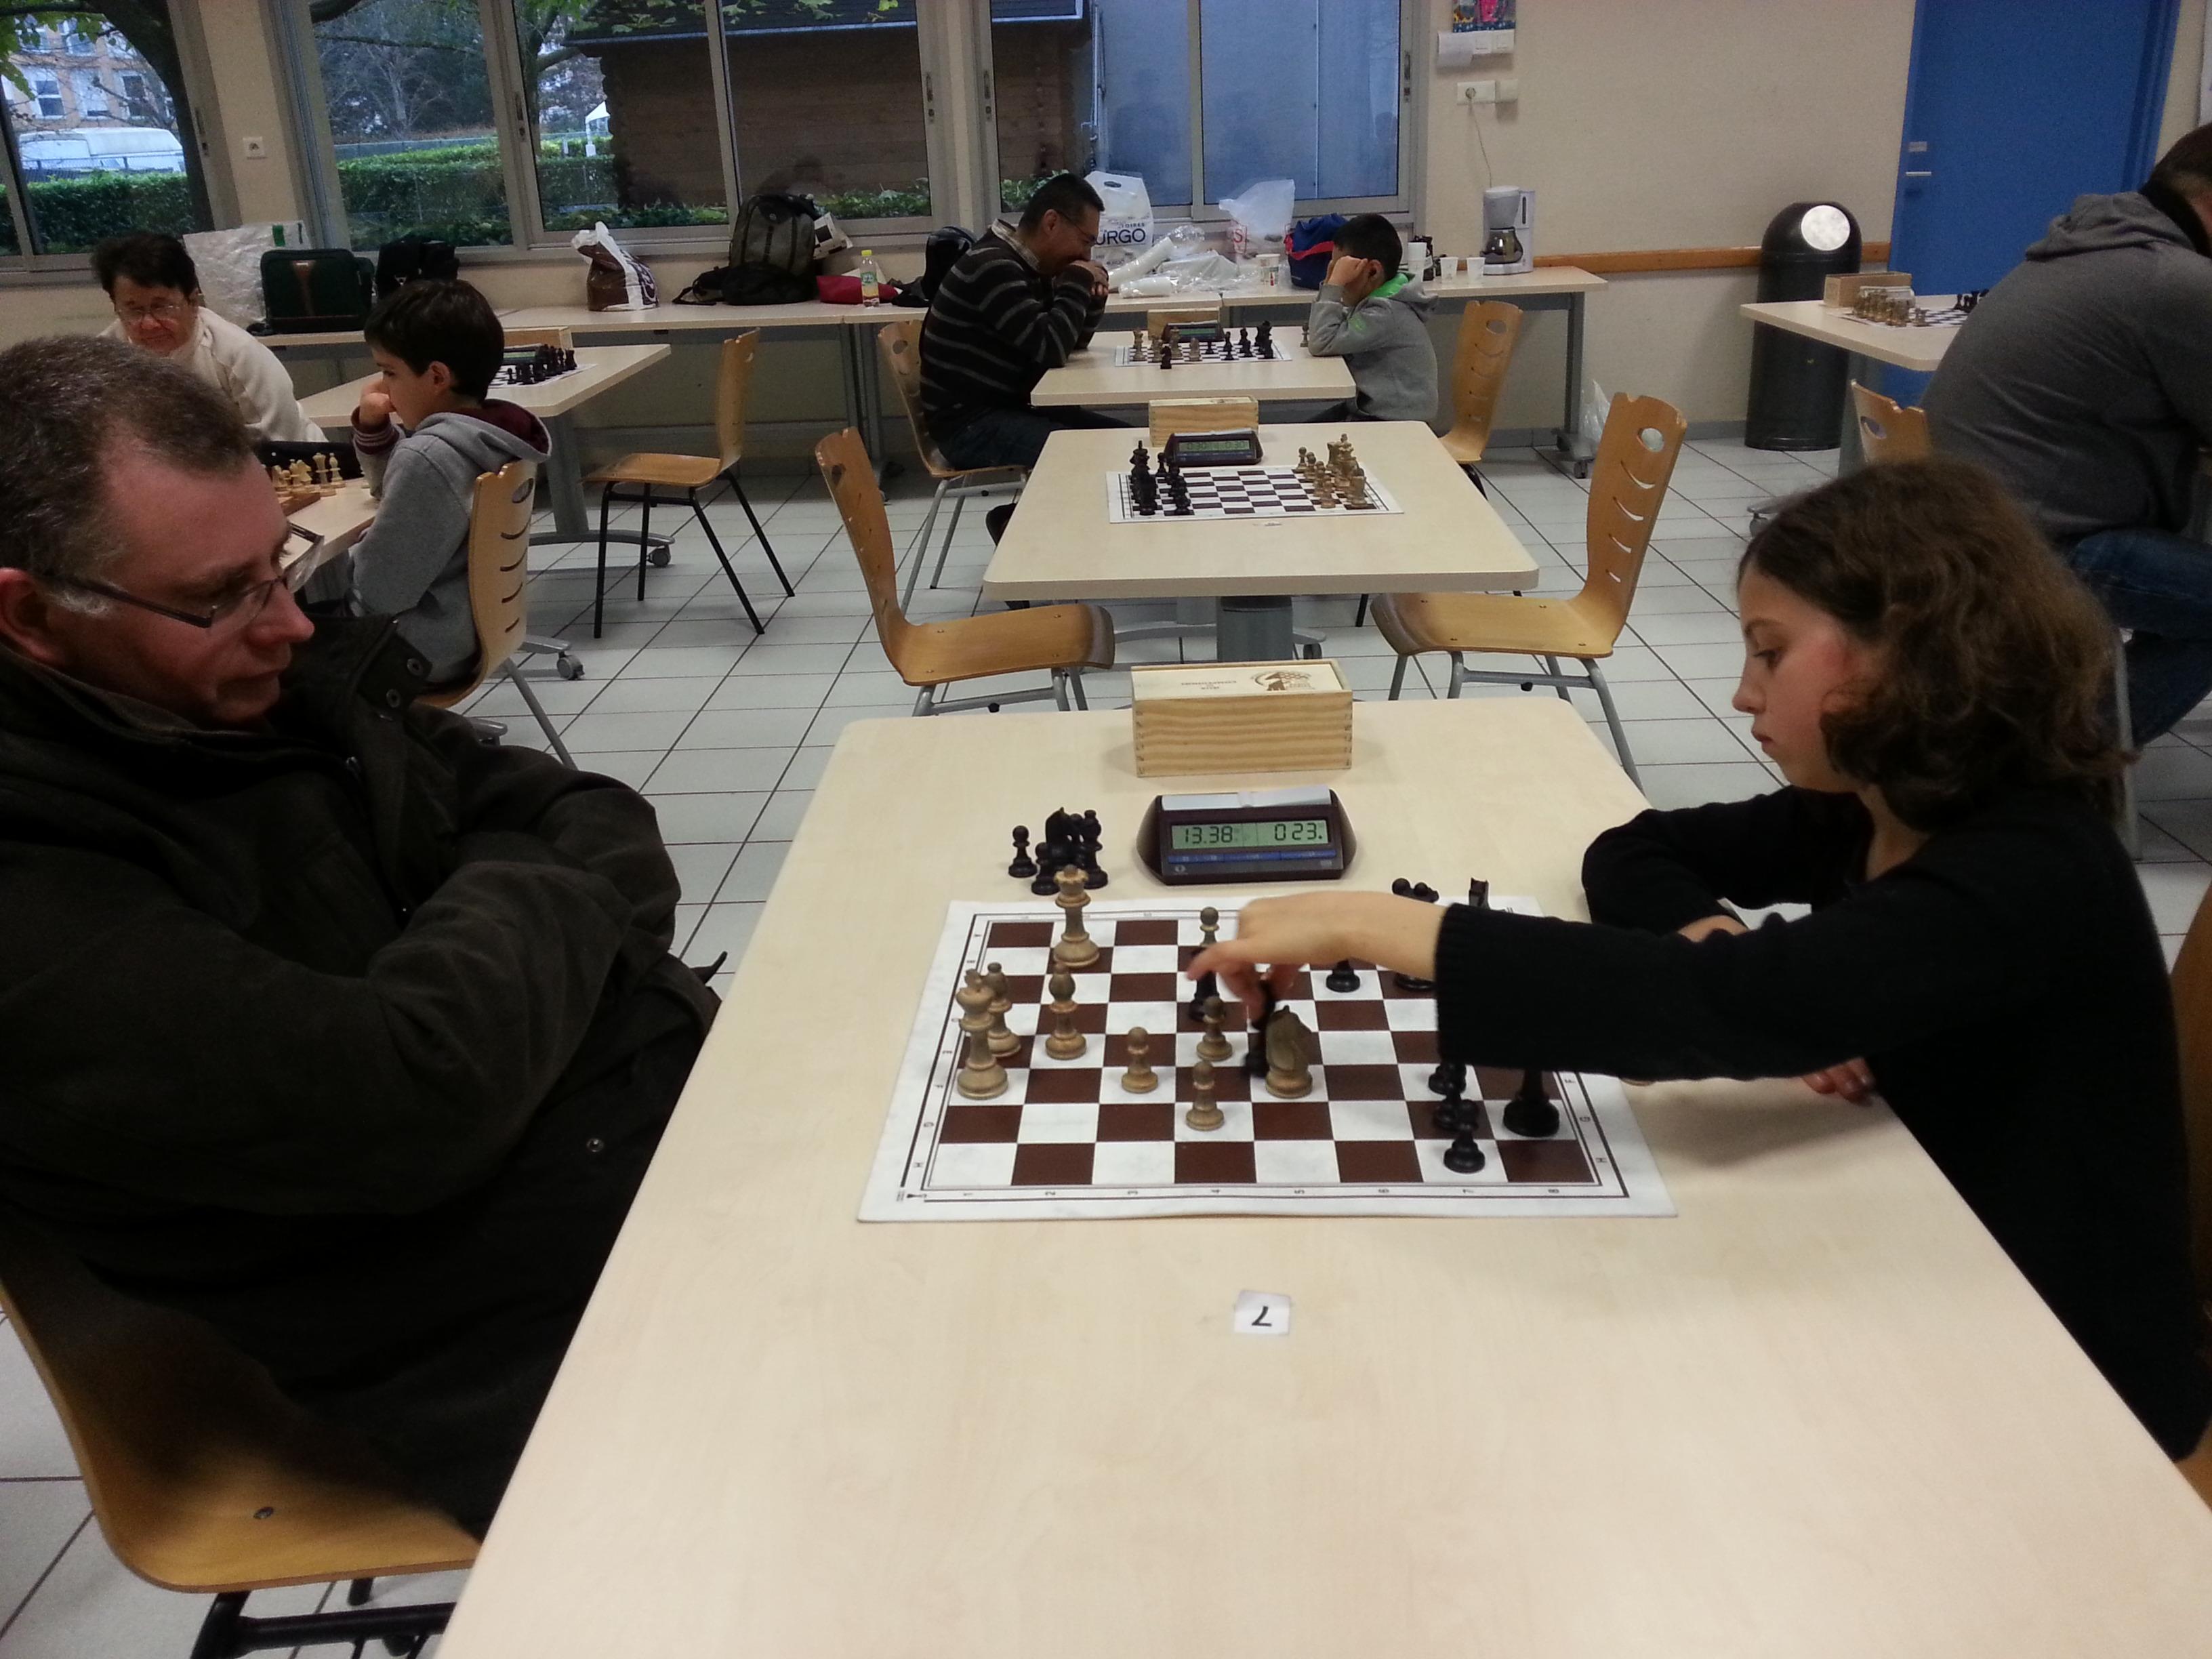 tournoi-interne-6-decembre-2014-academie-echecs-philidor-6